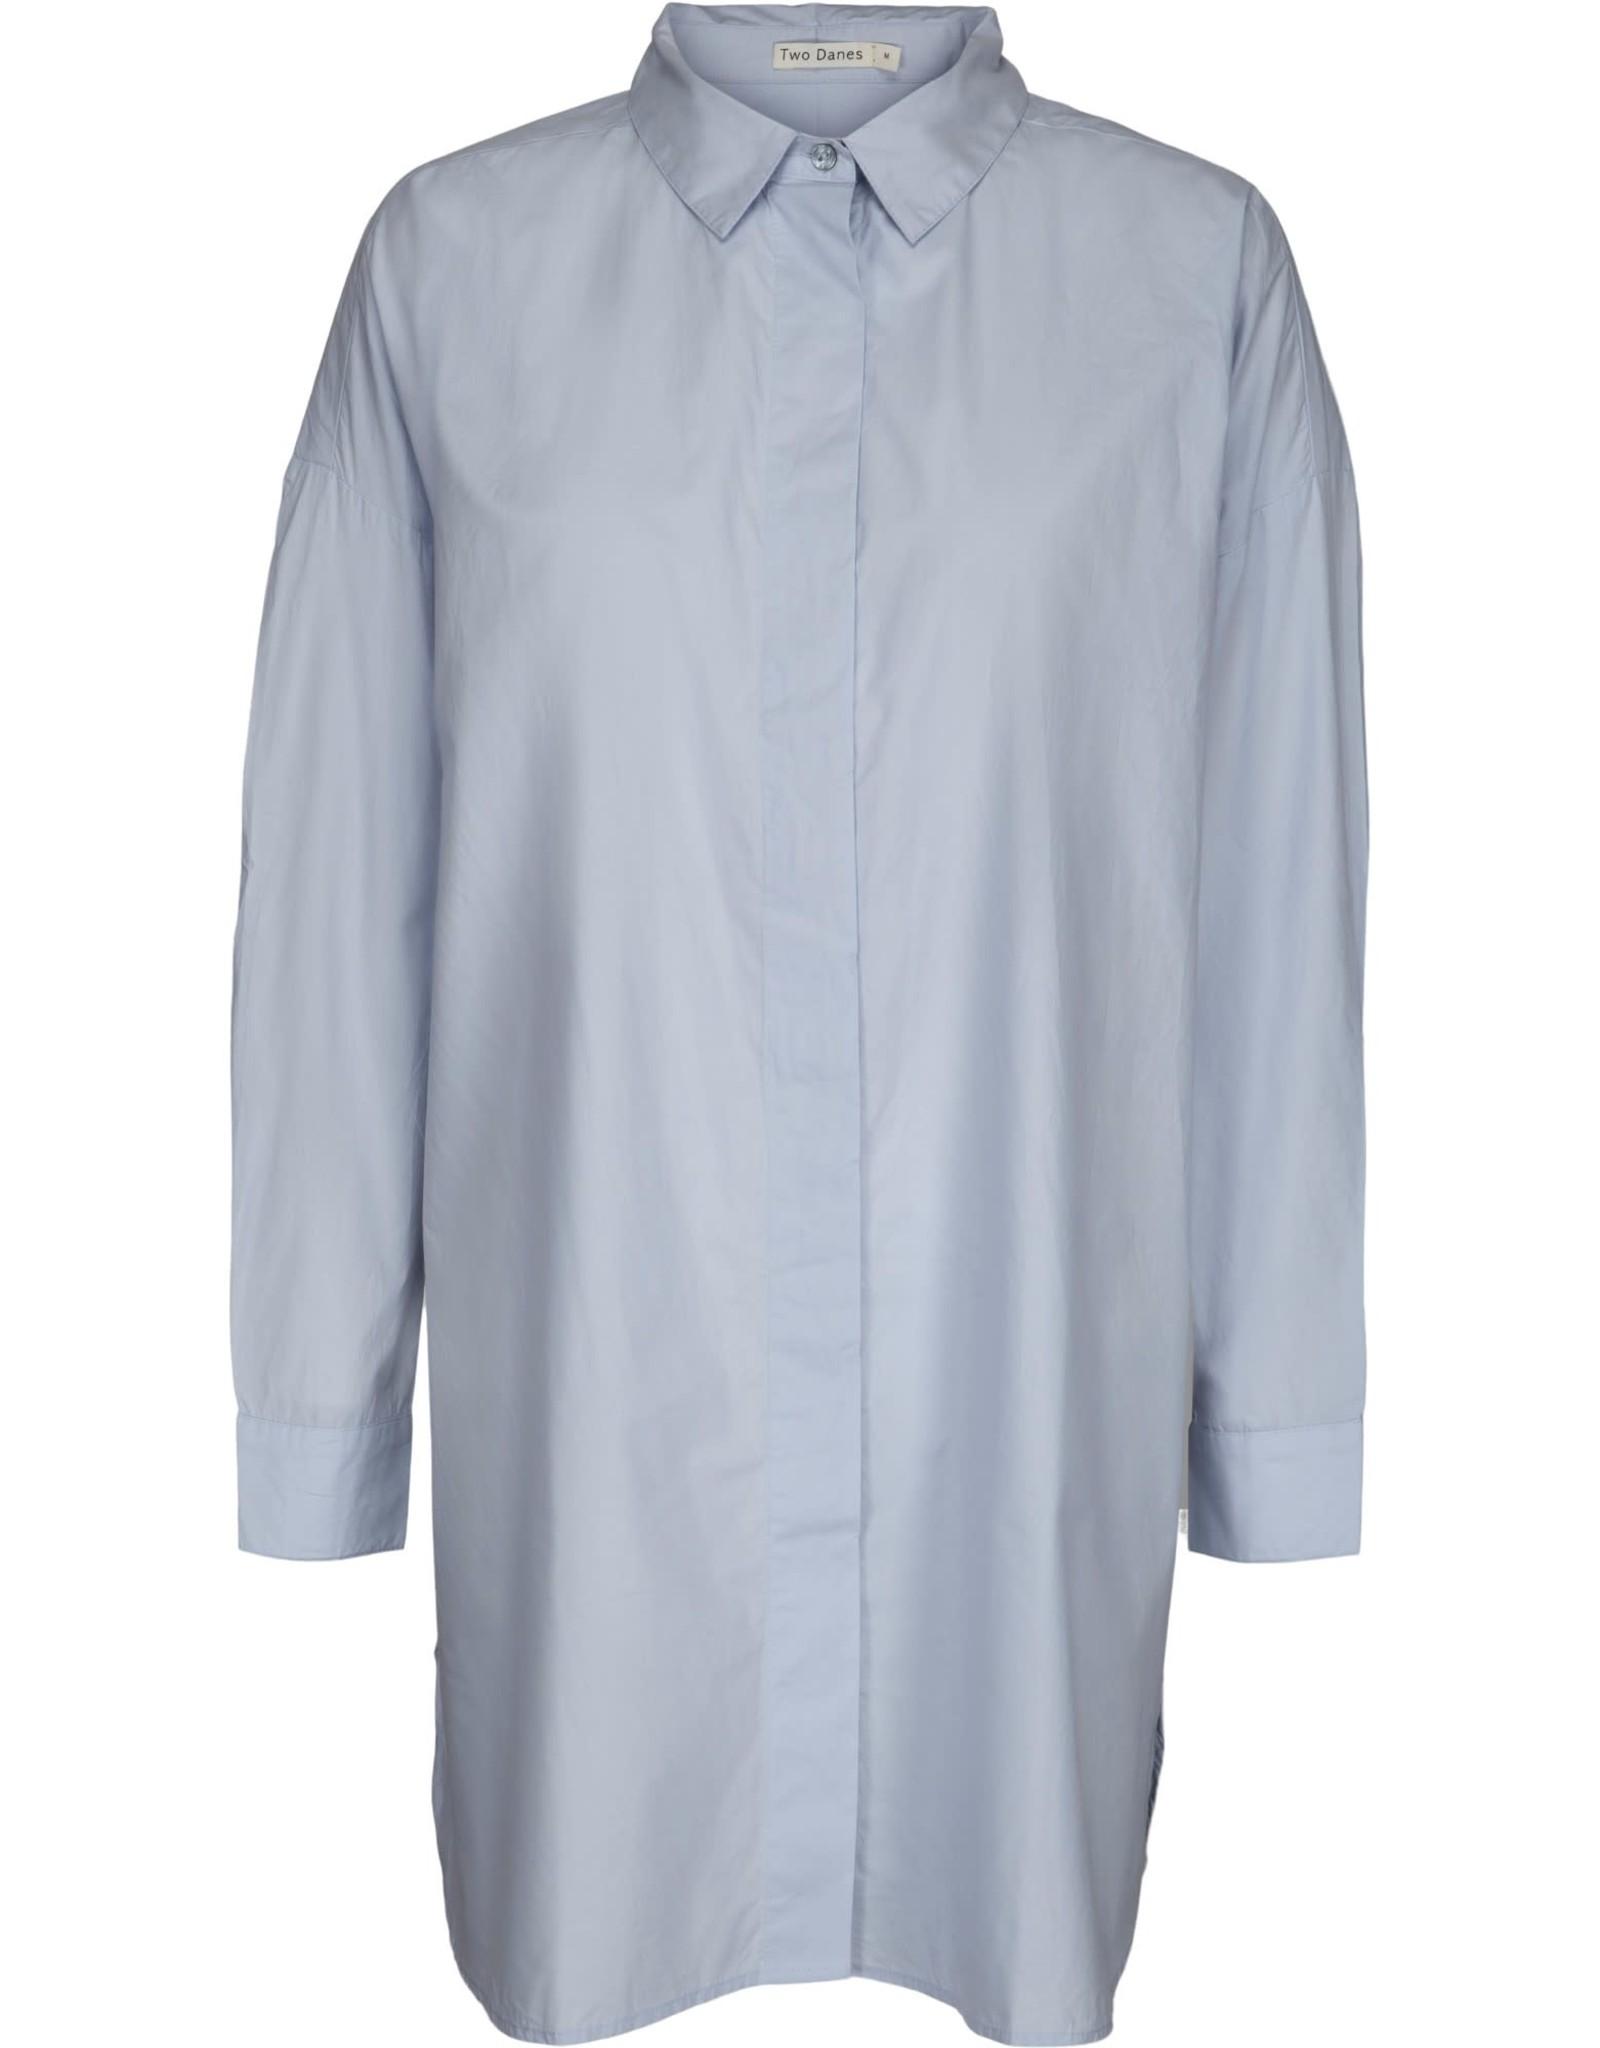 TWO DANES 17574 164 Diana big shirt cottton poplin